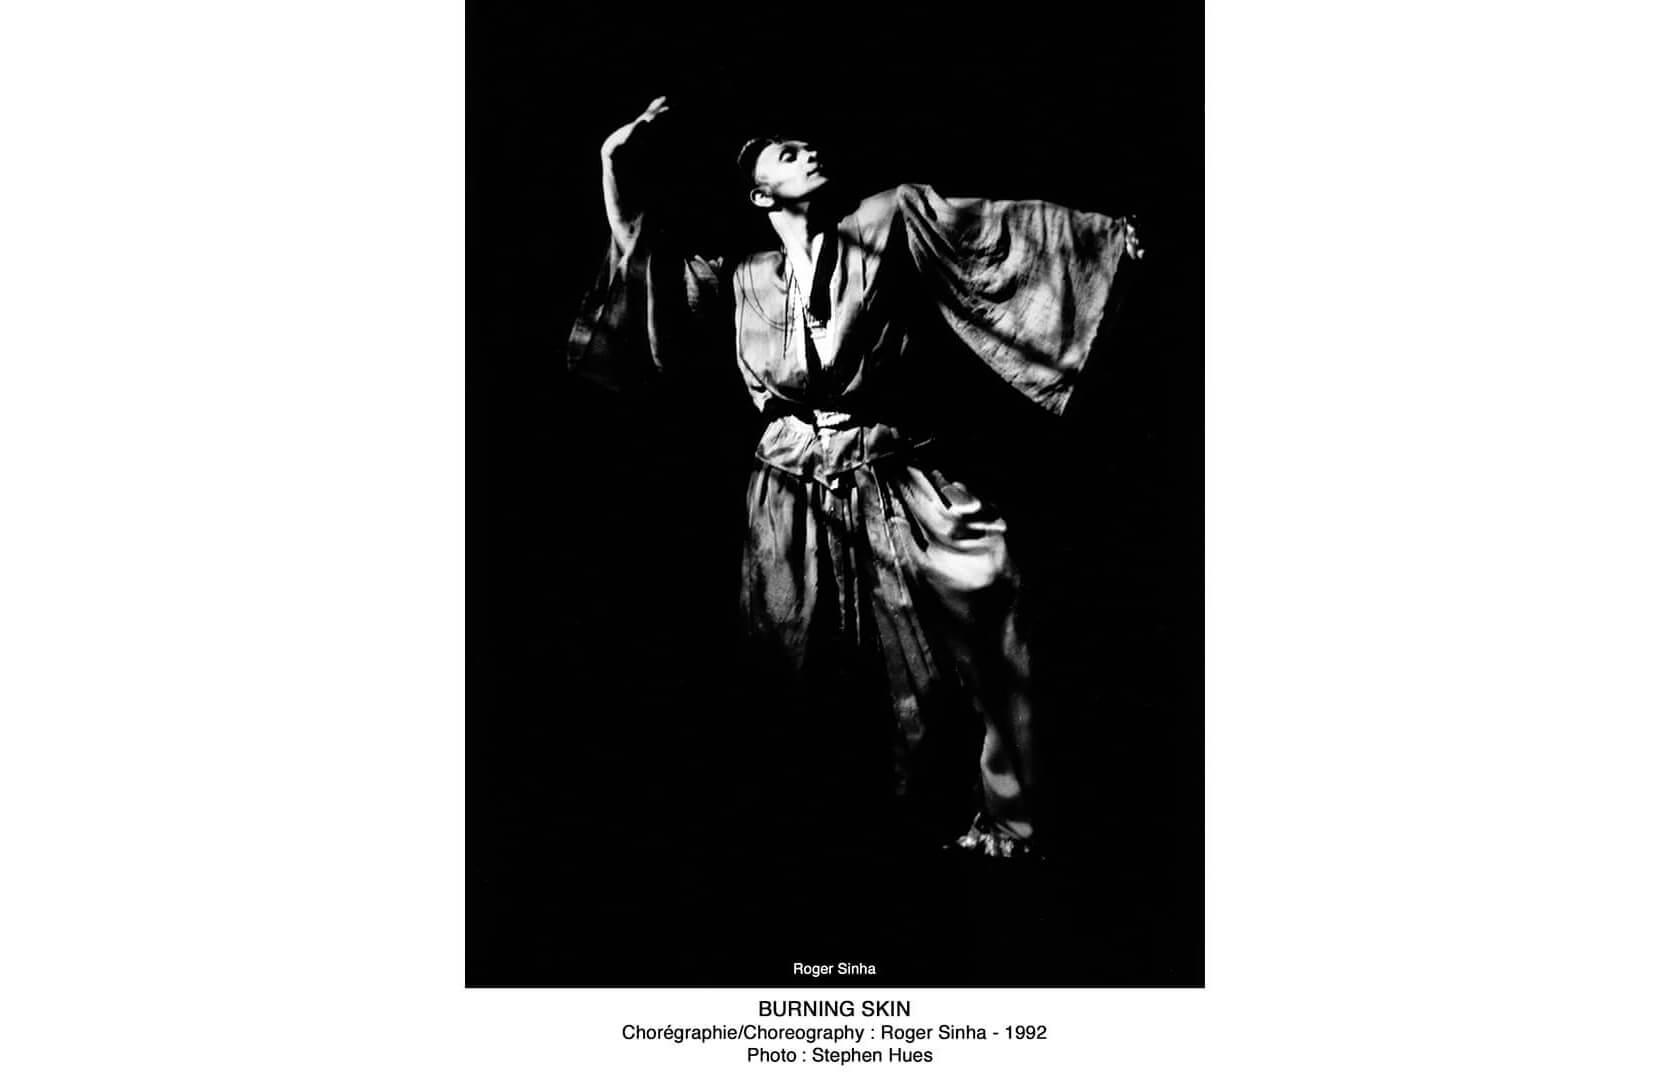 Sinha Danse 1992, Burning Skin, Roger Sinha. Image credit: Stephen Hues